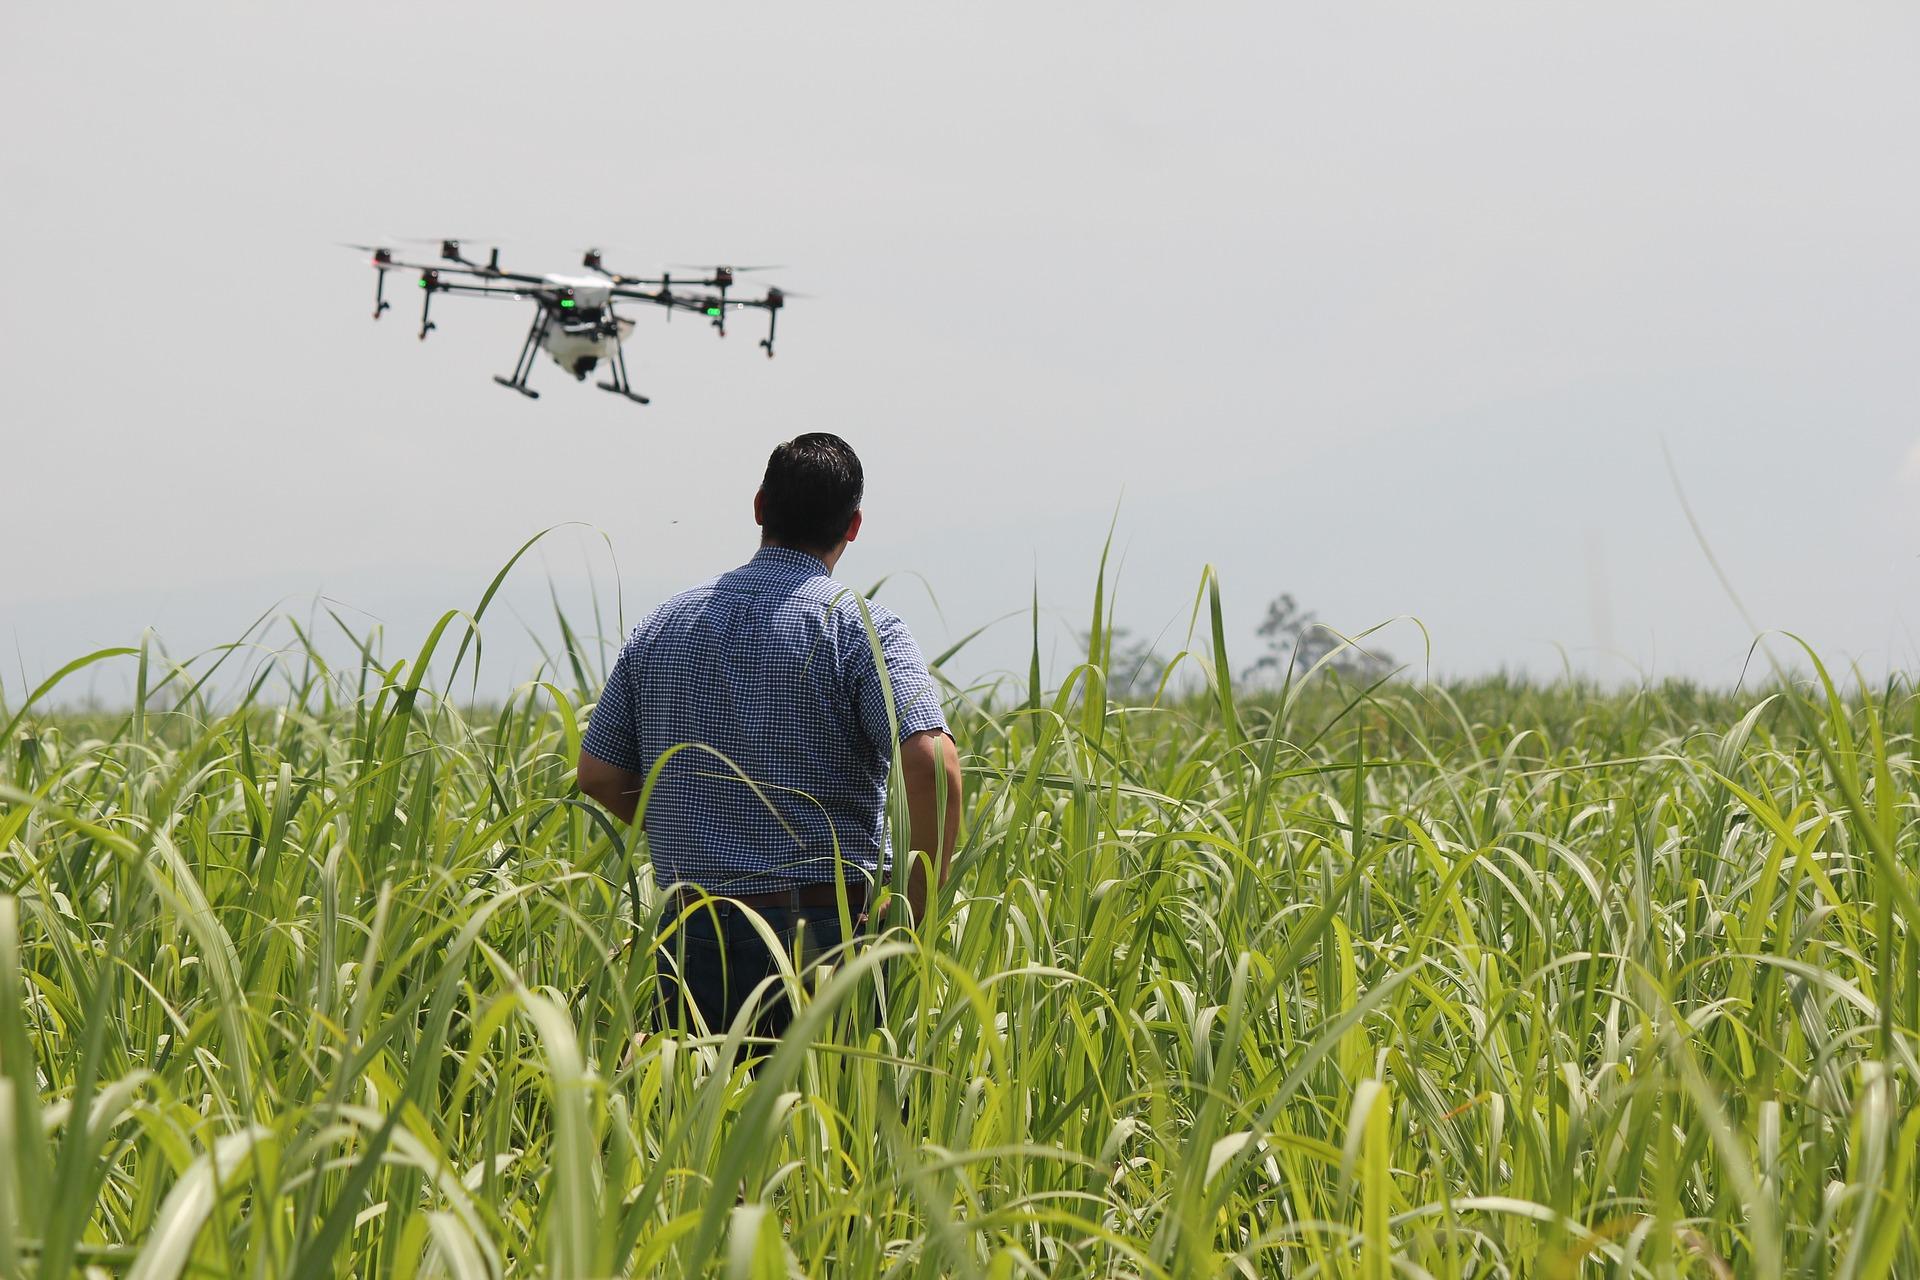 Drohnen, UNIQA Experteninterview, Jagdfakten.at